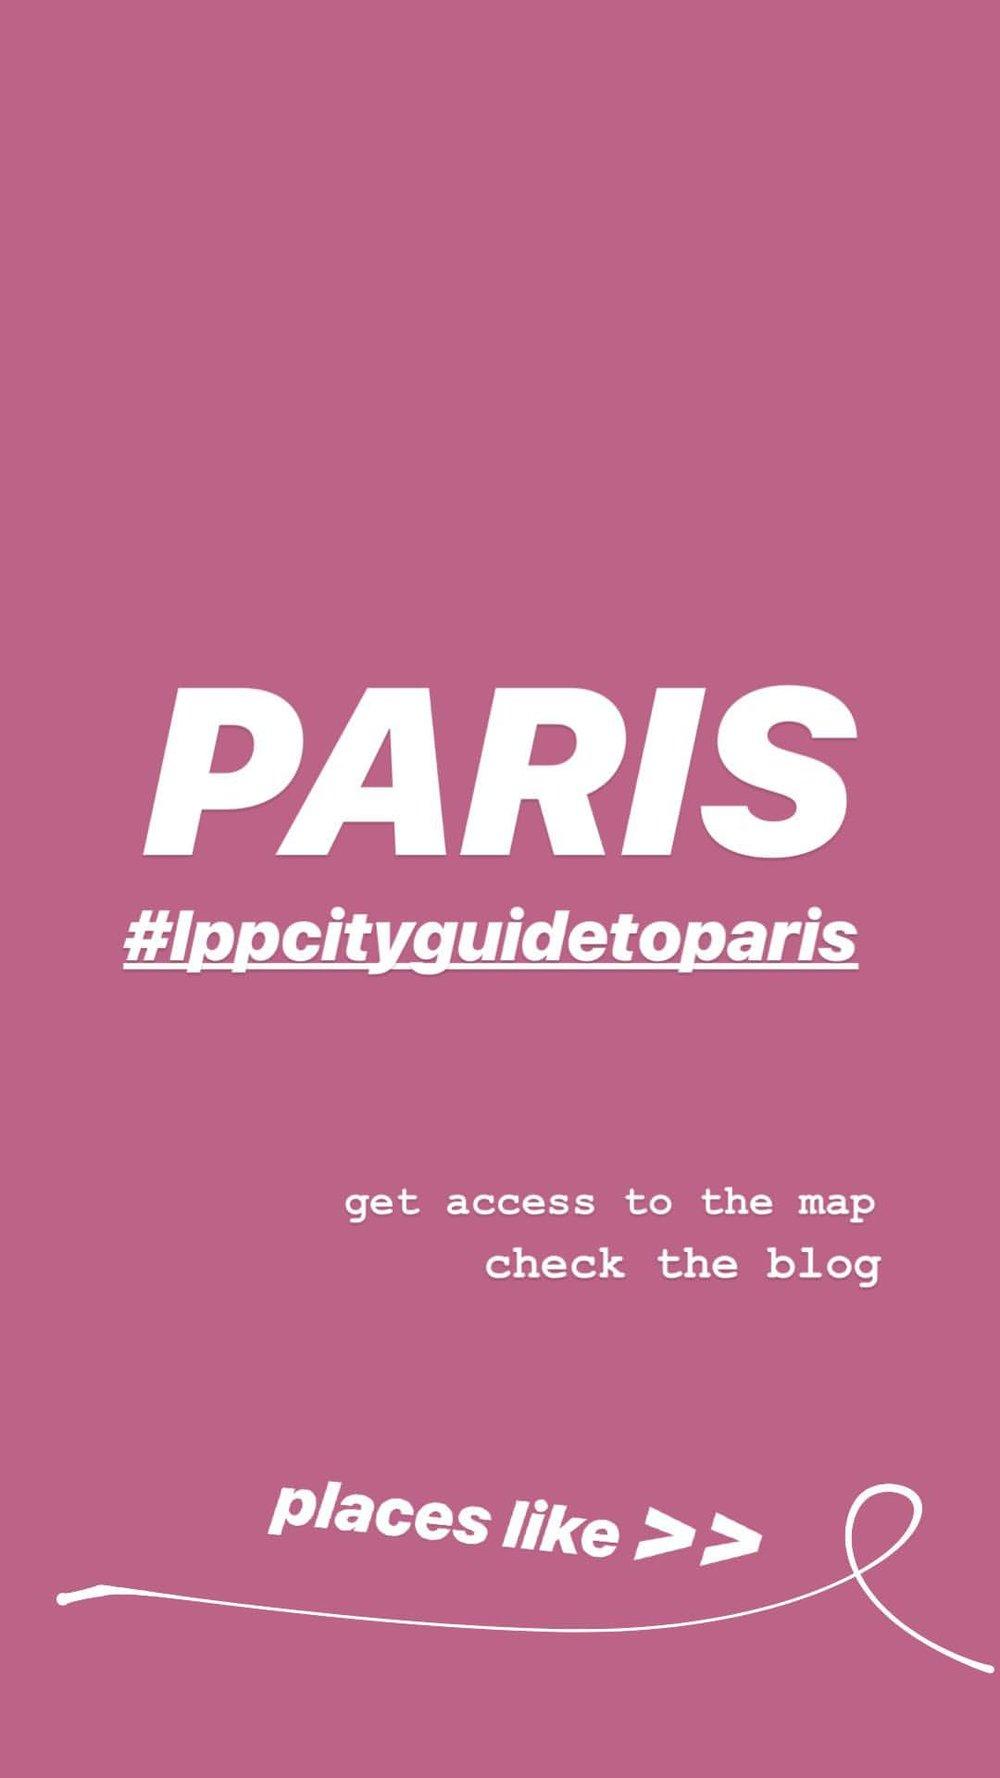 PARIS-cityguide-food-guidedbyfood-1.jpg